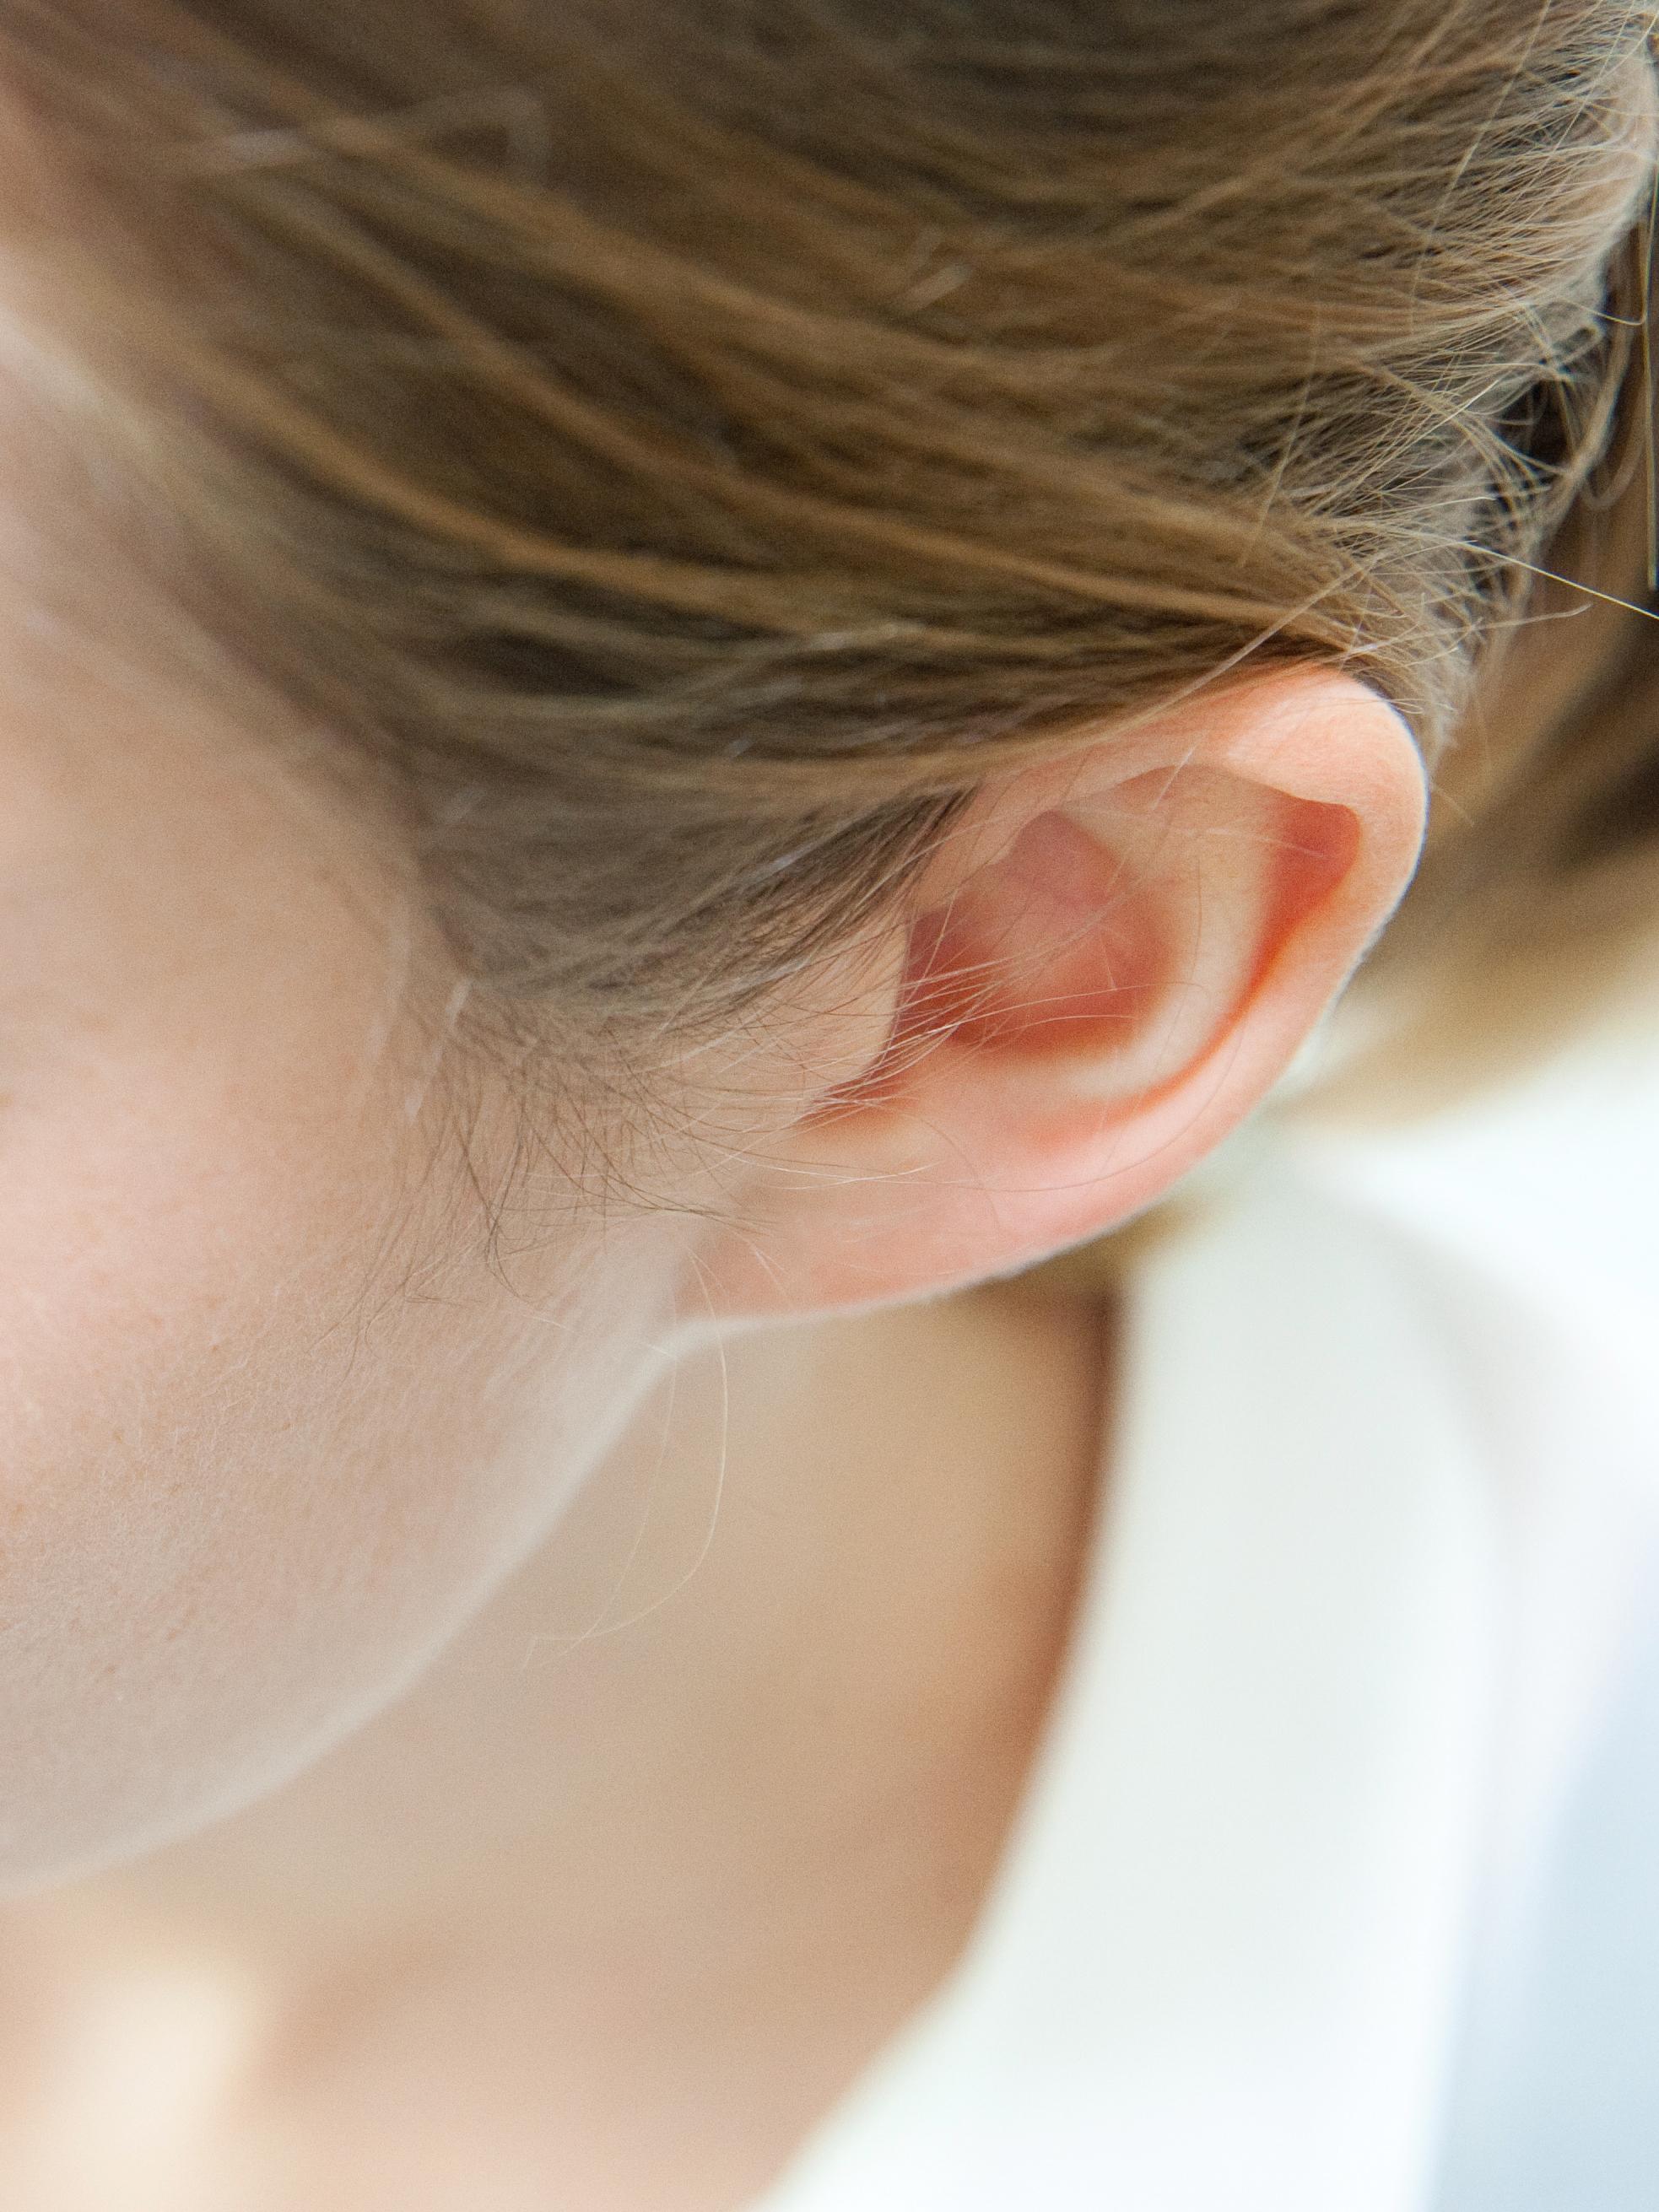 Siete consejos para tener oídos sanos